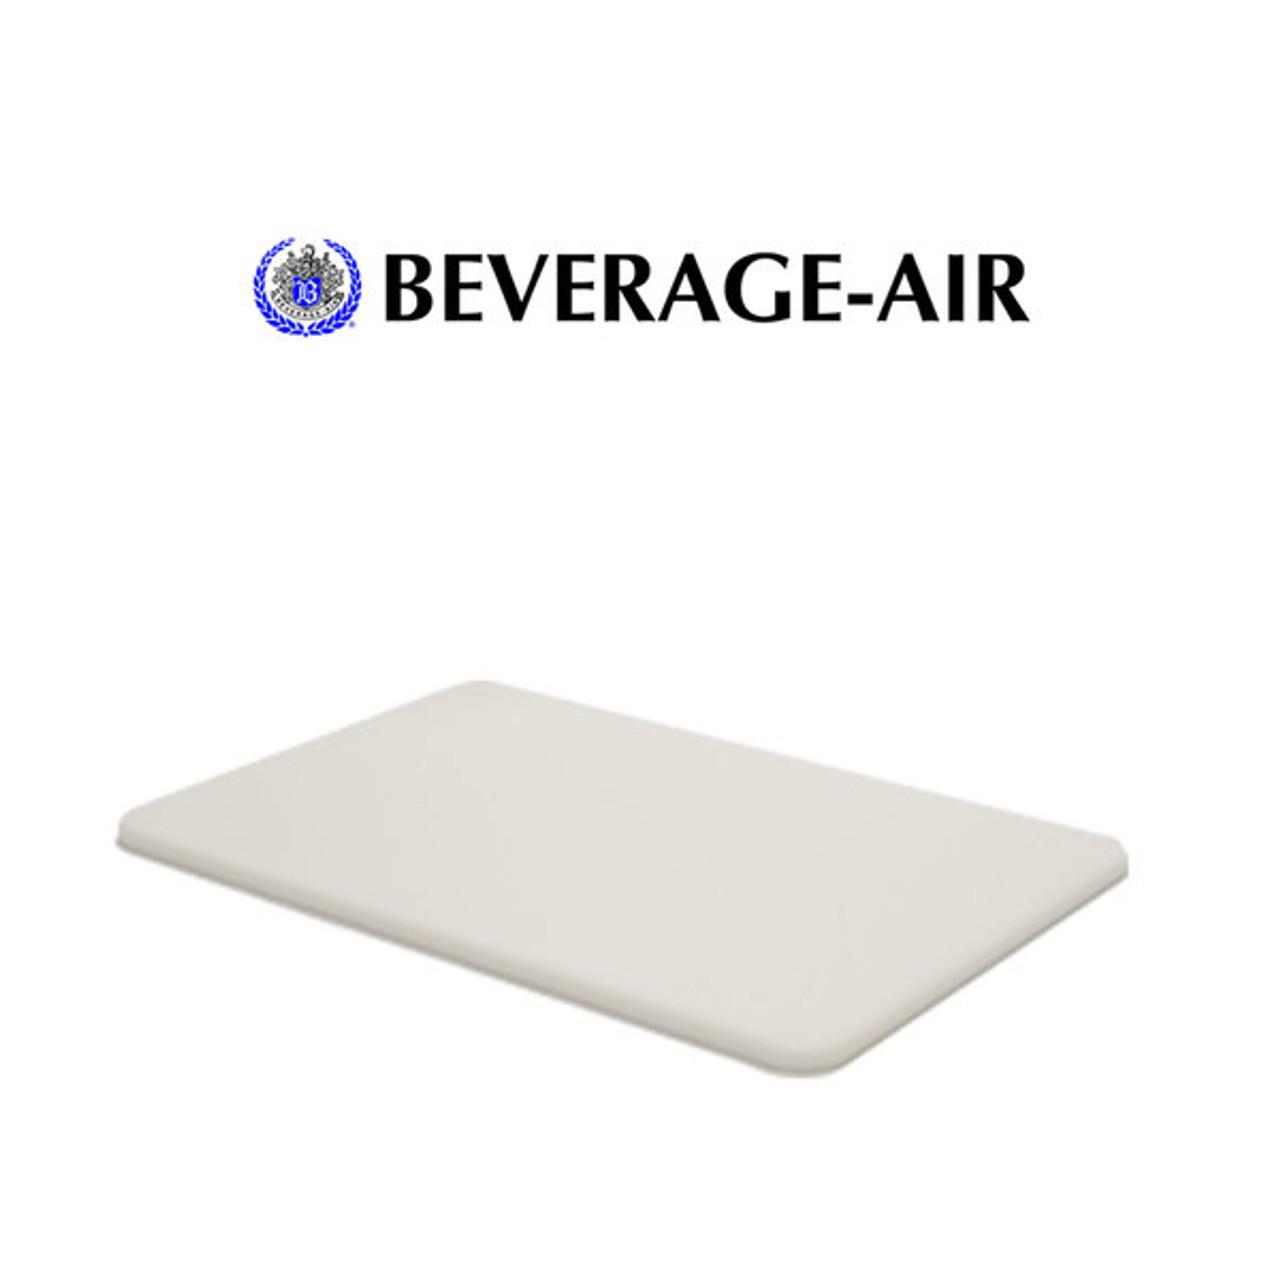 OEM Cutting Board - Beverage Air - P#: 705-266C